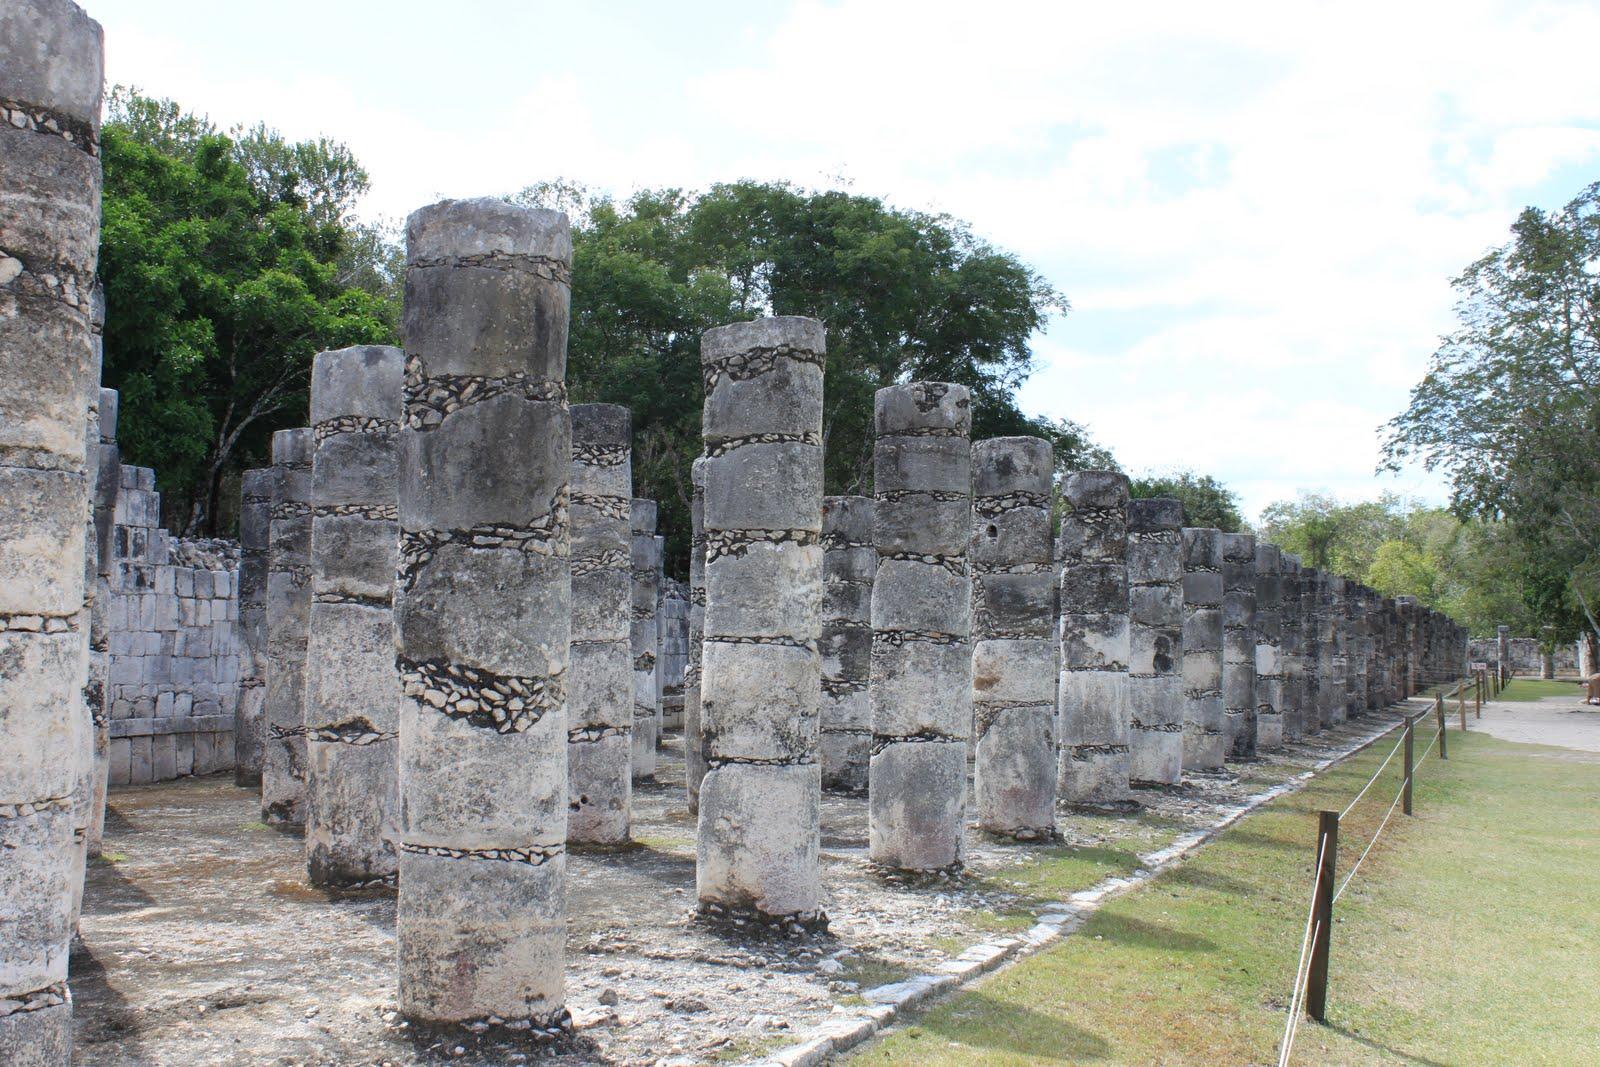 http://2.bp.blogspot.com/-kEet2bz_OMY/TropLkVTitI/AAAAAAAAECU/GbJjwqDwxZI/s1600/hd+wallpapers+Cancun+Mexico.jpg